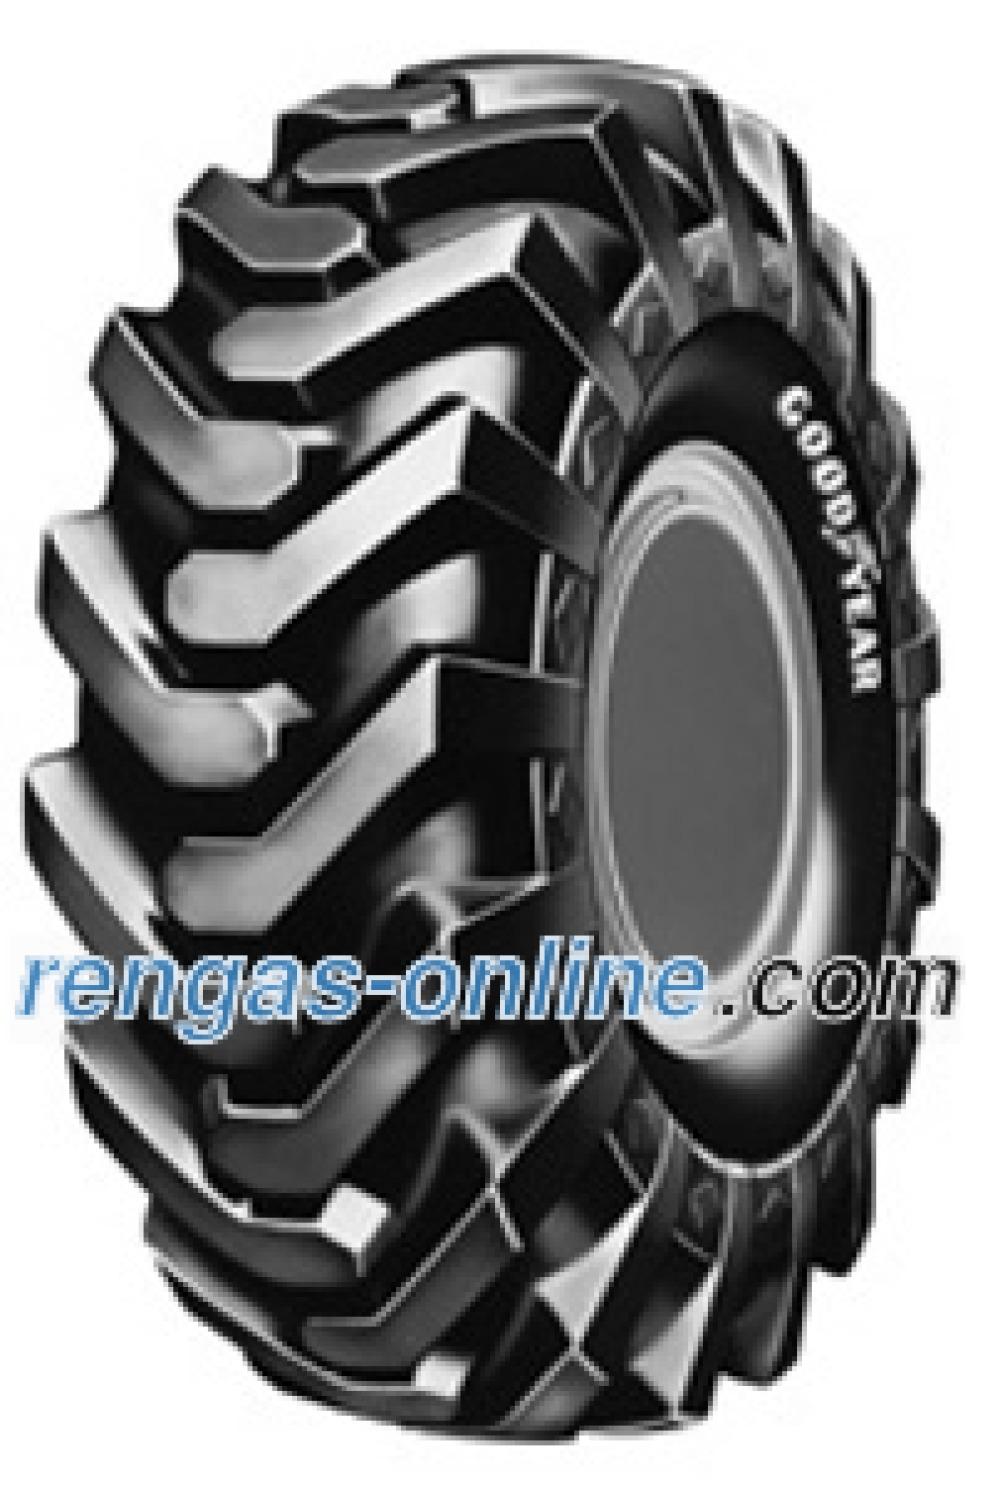 goodyear-sgg-2a-1300-24-12pr-tl